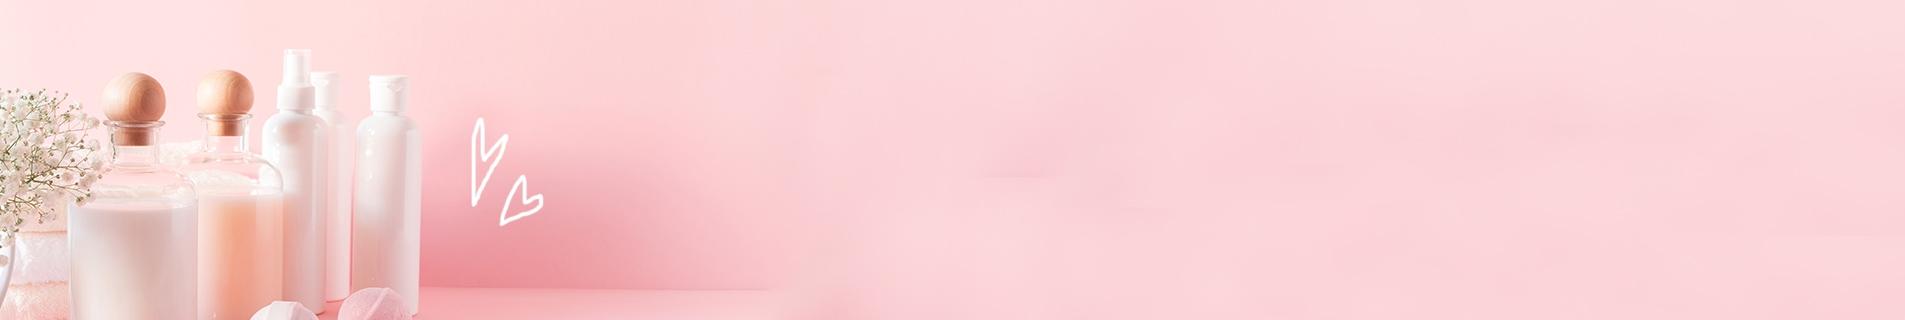 Promo SAGA Cosmetics | Site de cosmetique pas cher